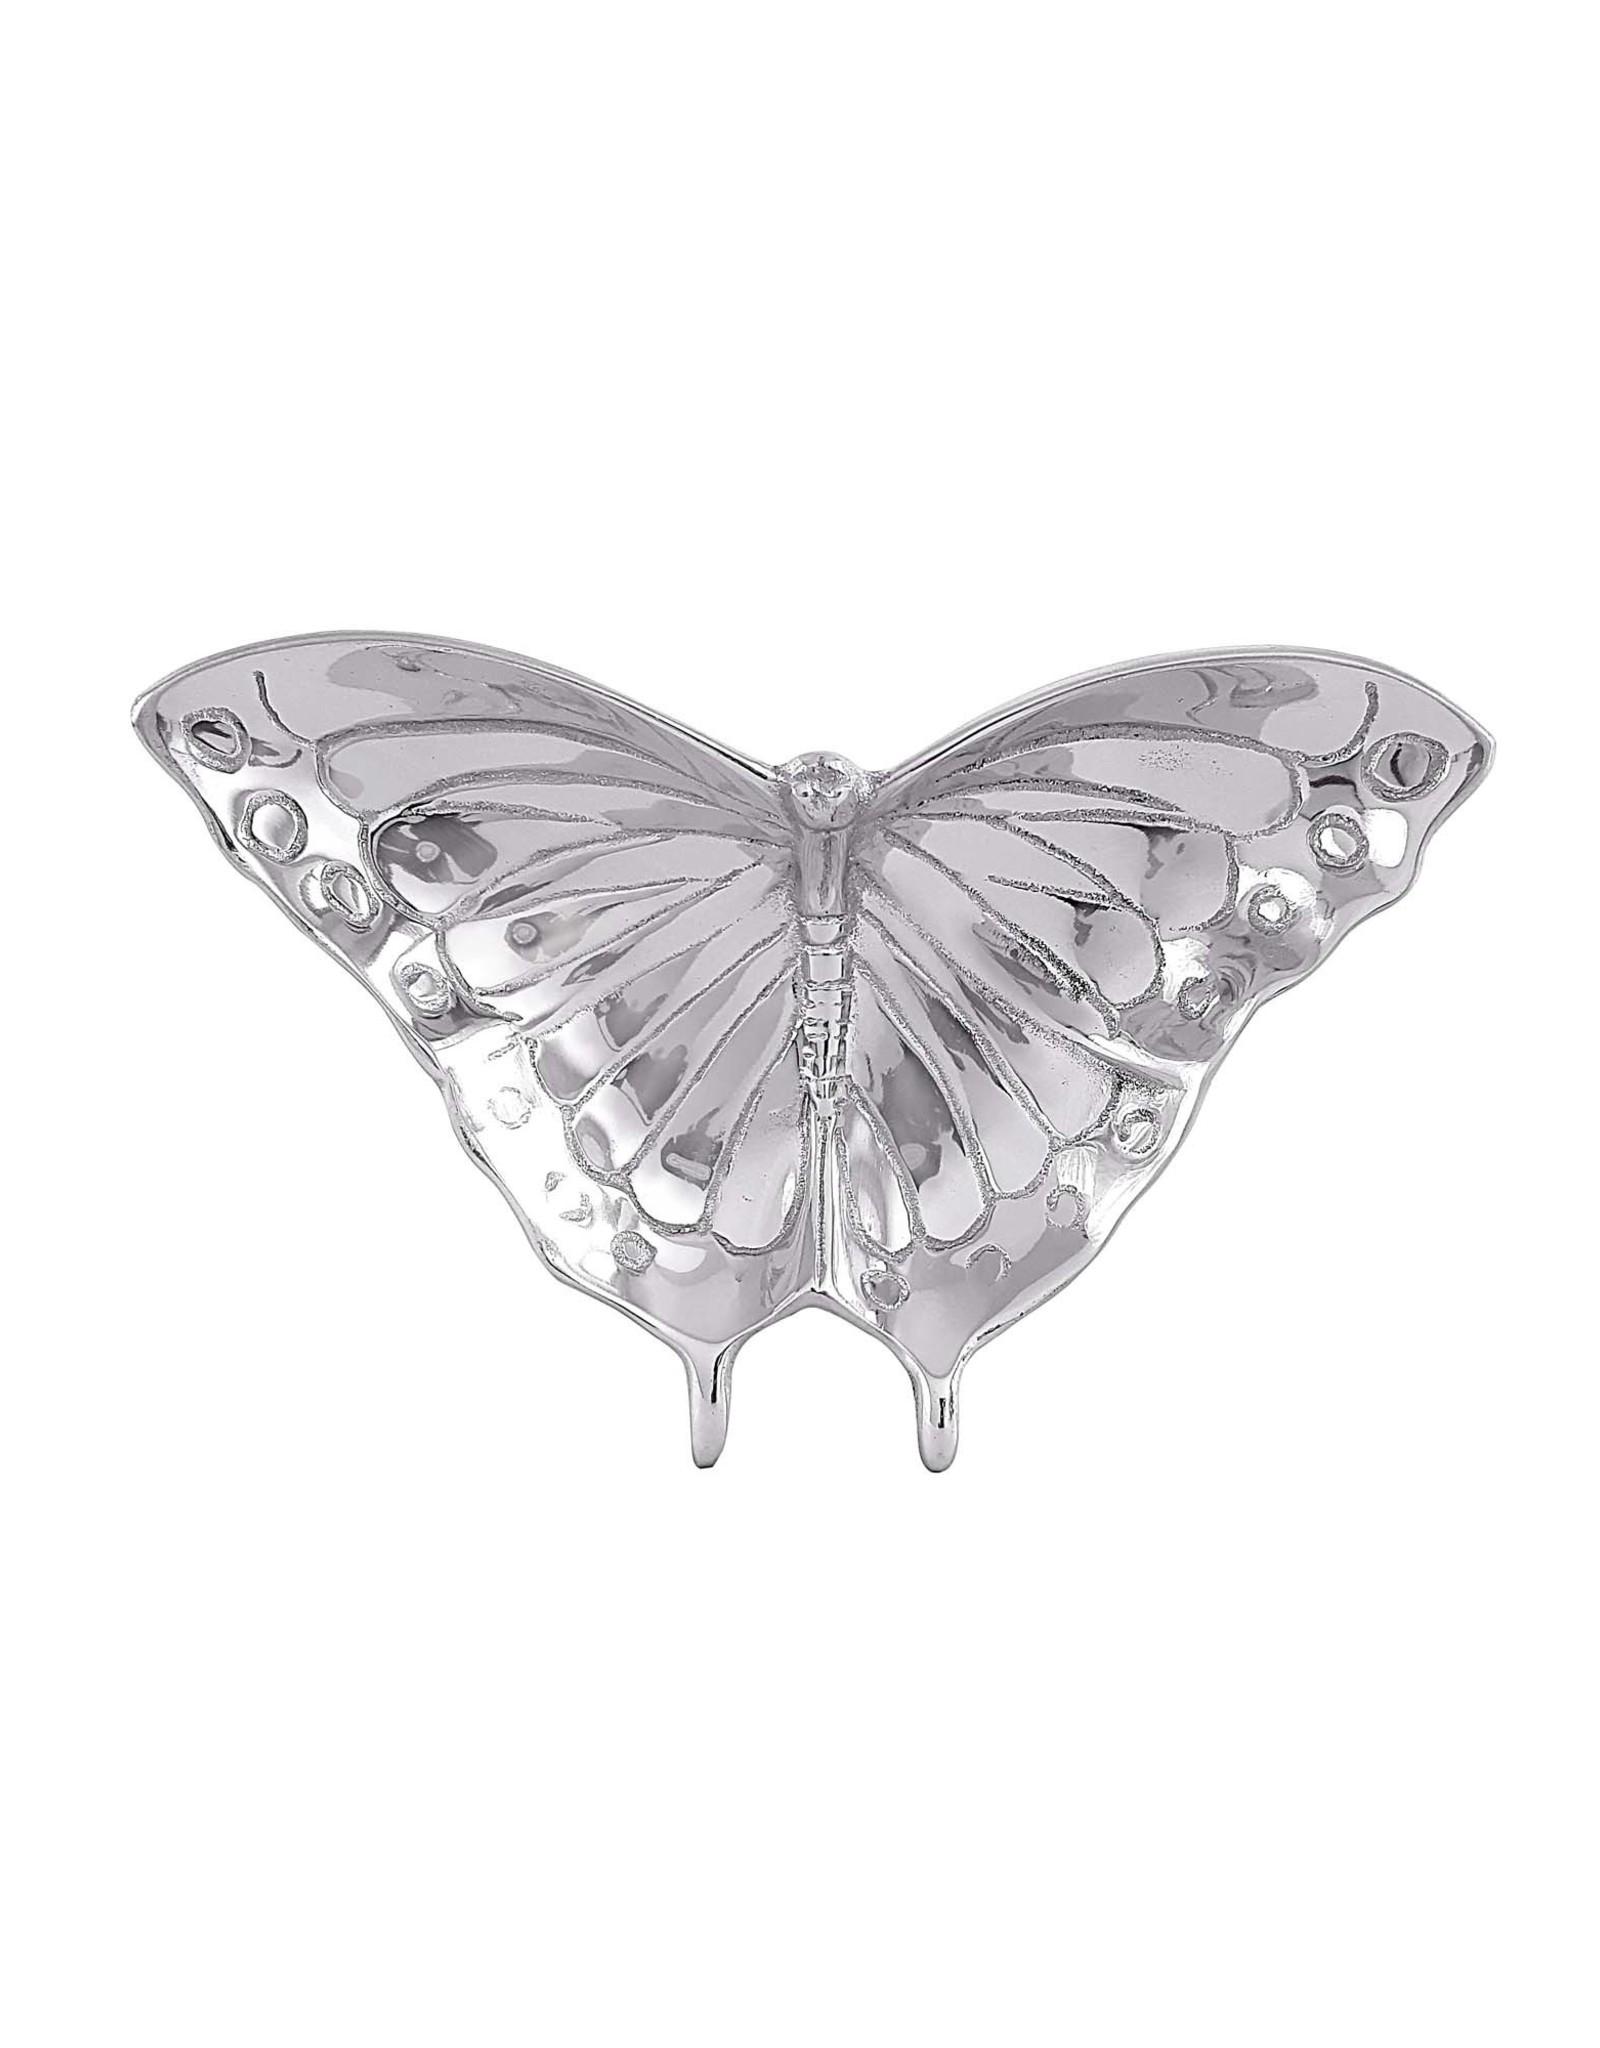 Mariposa Swallowtail Nut Dish